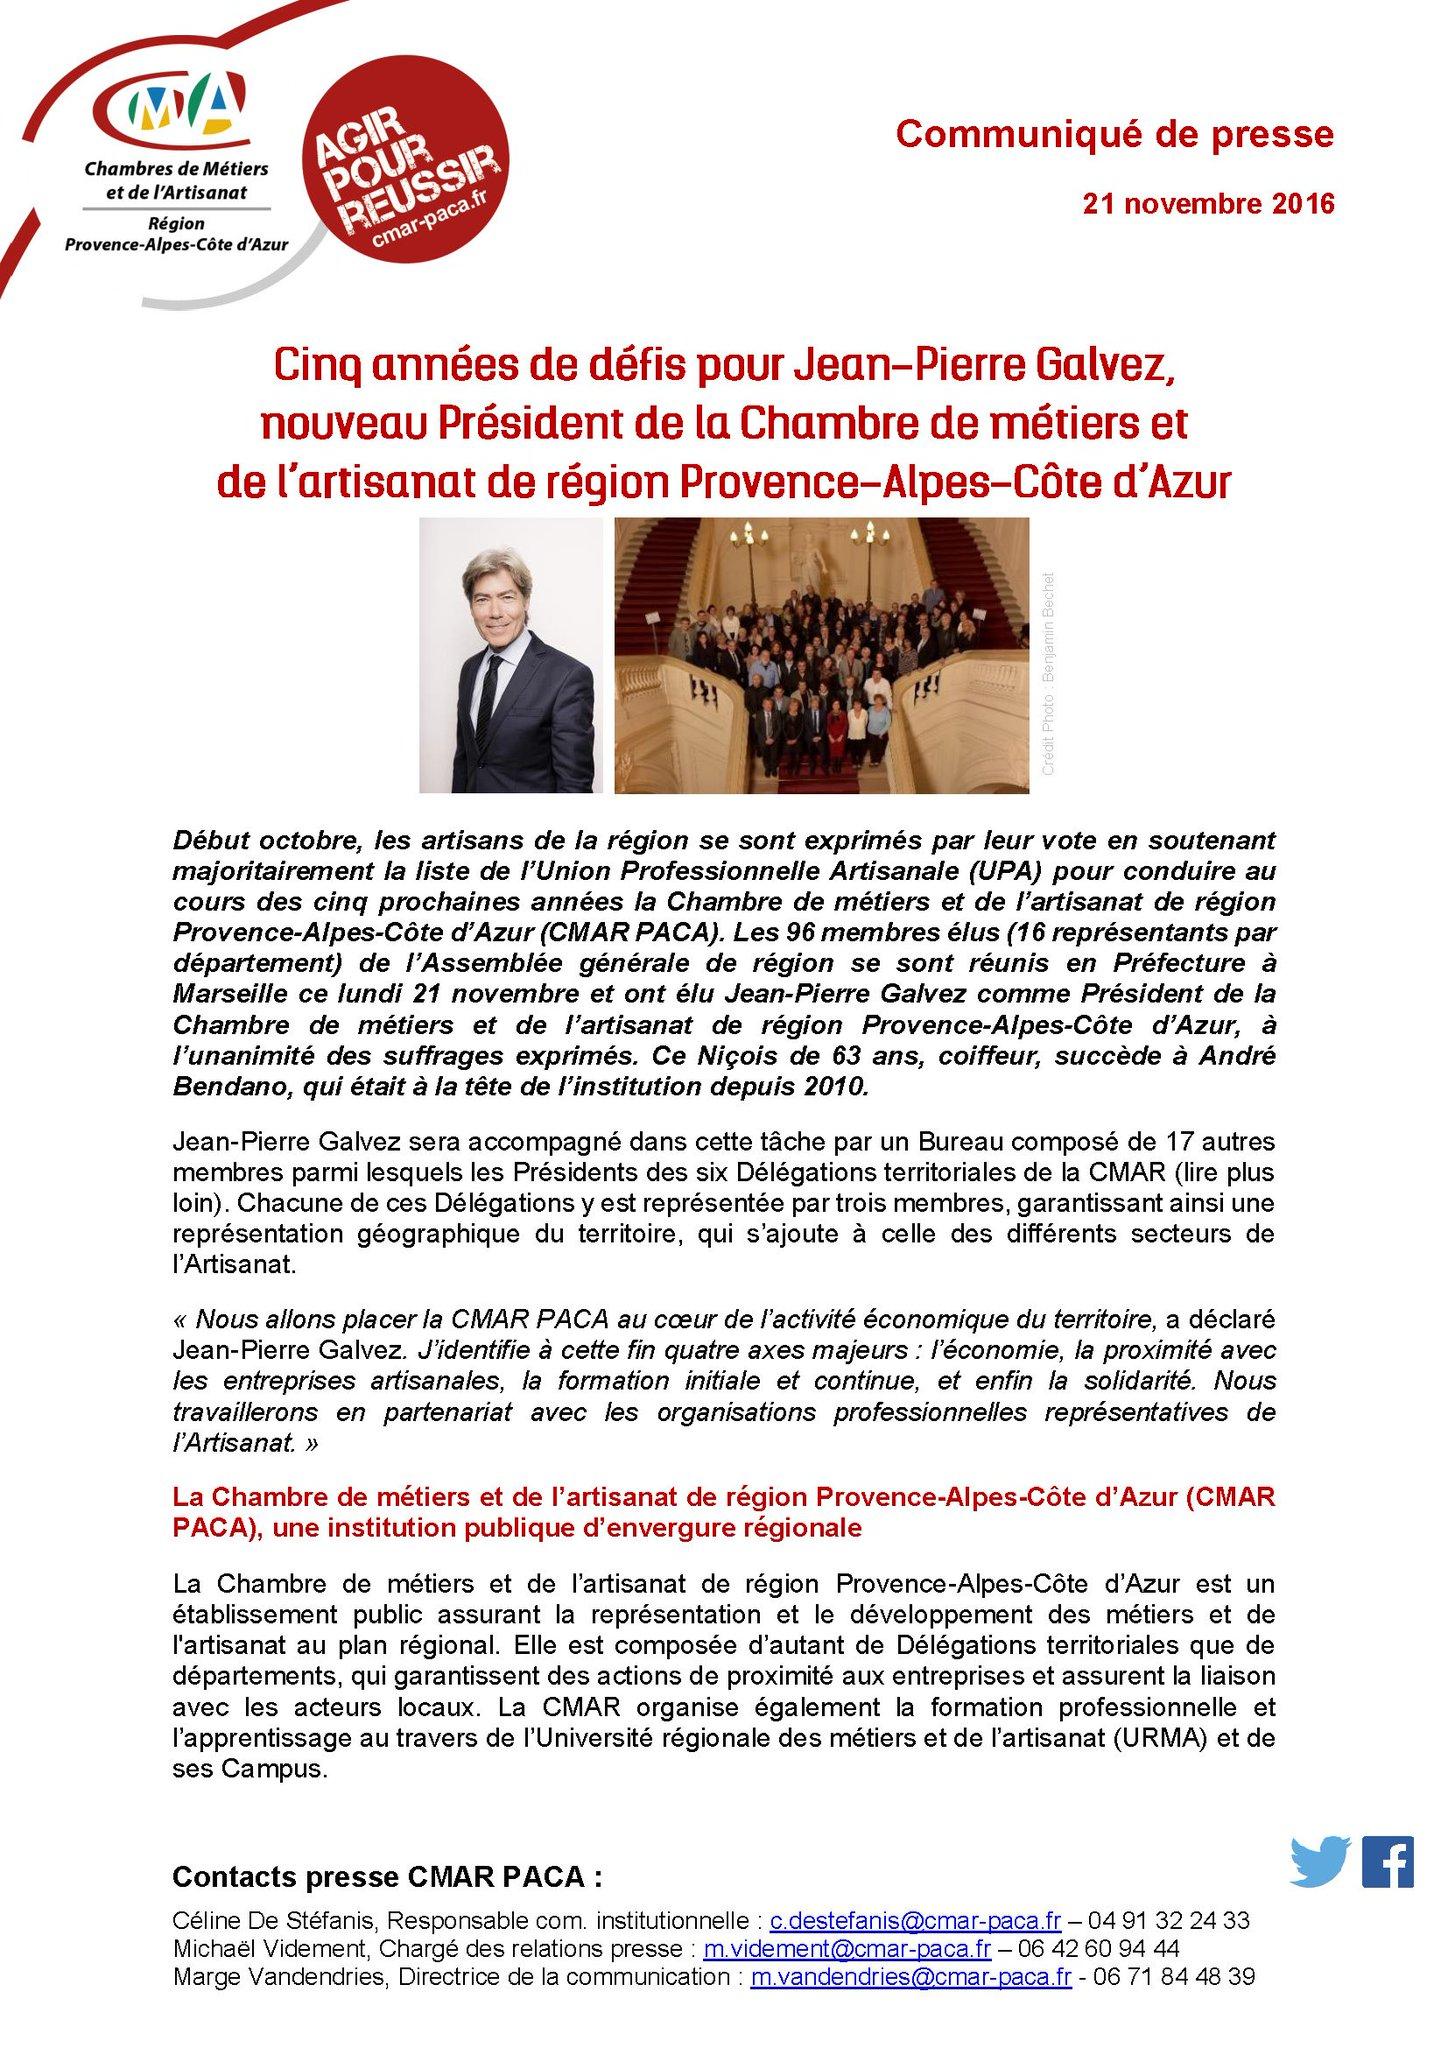 "CMAR PACA on Twitter "" muniquédePresse"